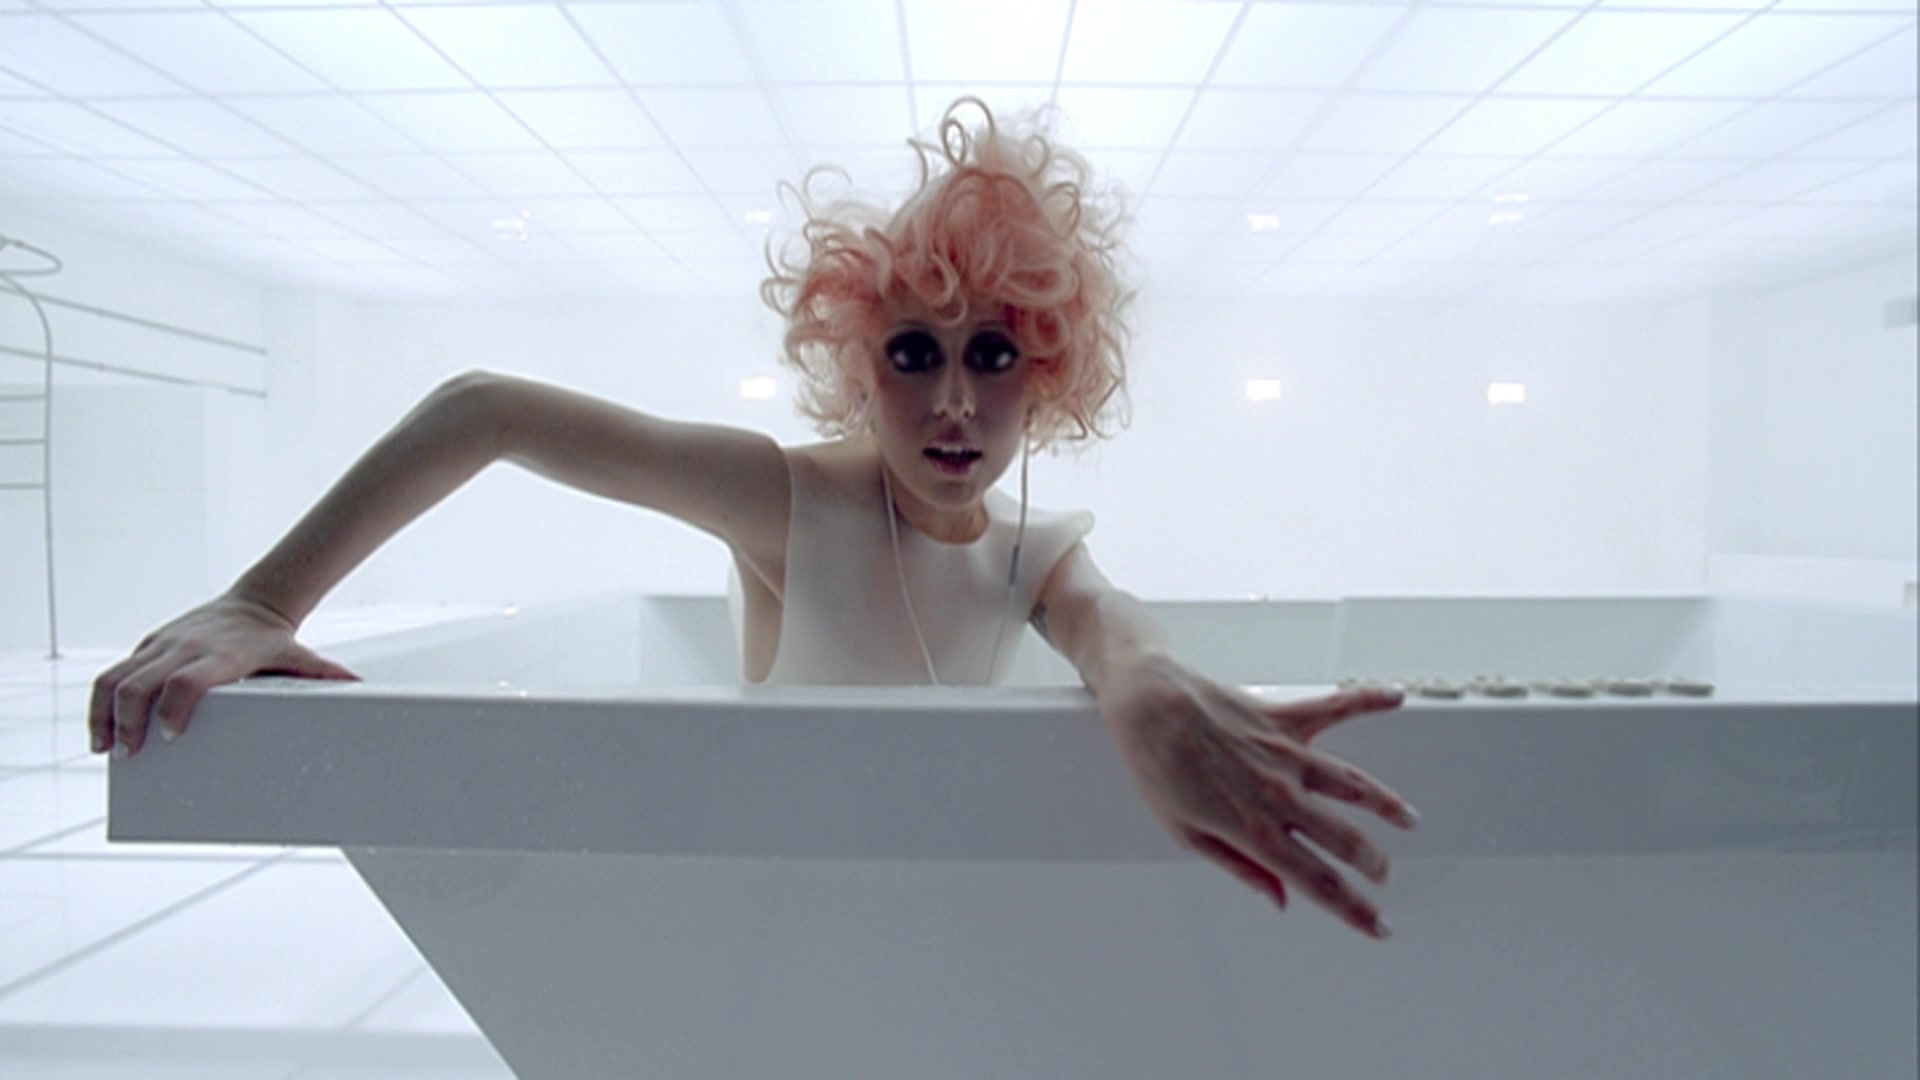 File:Lady Gaga - Bad Romance 012.jpg